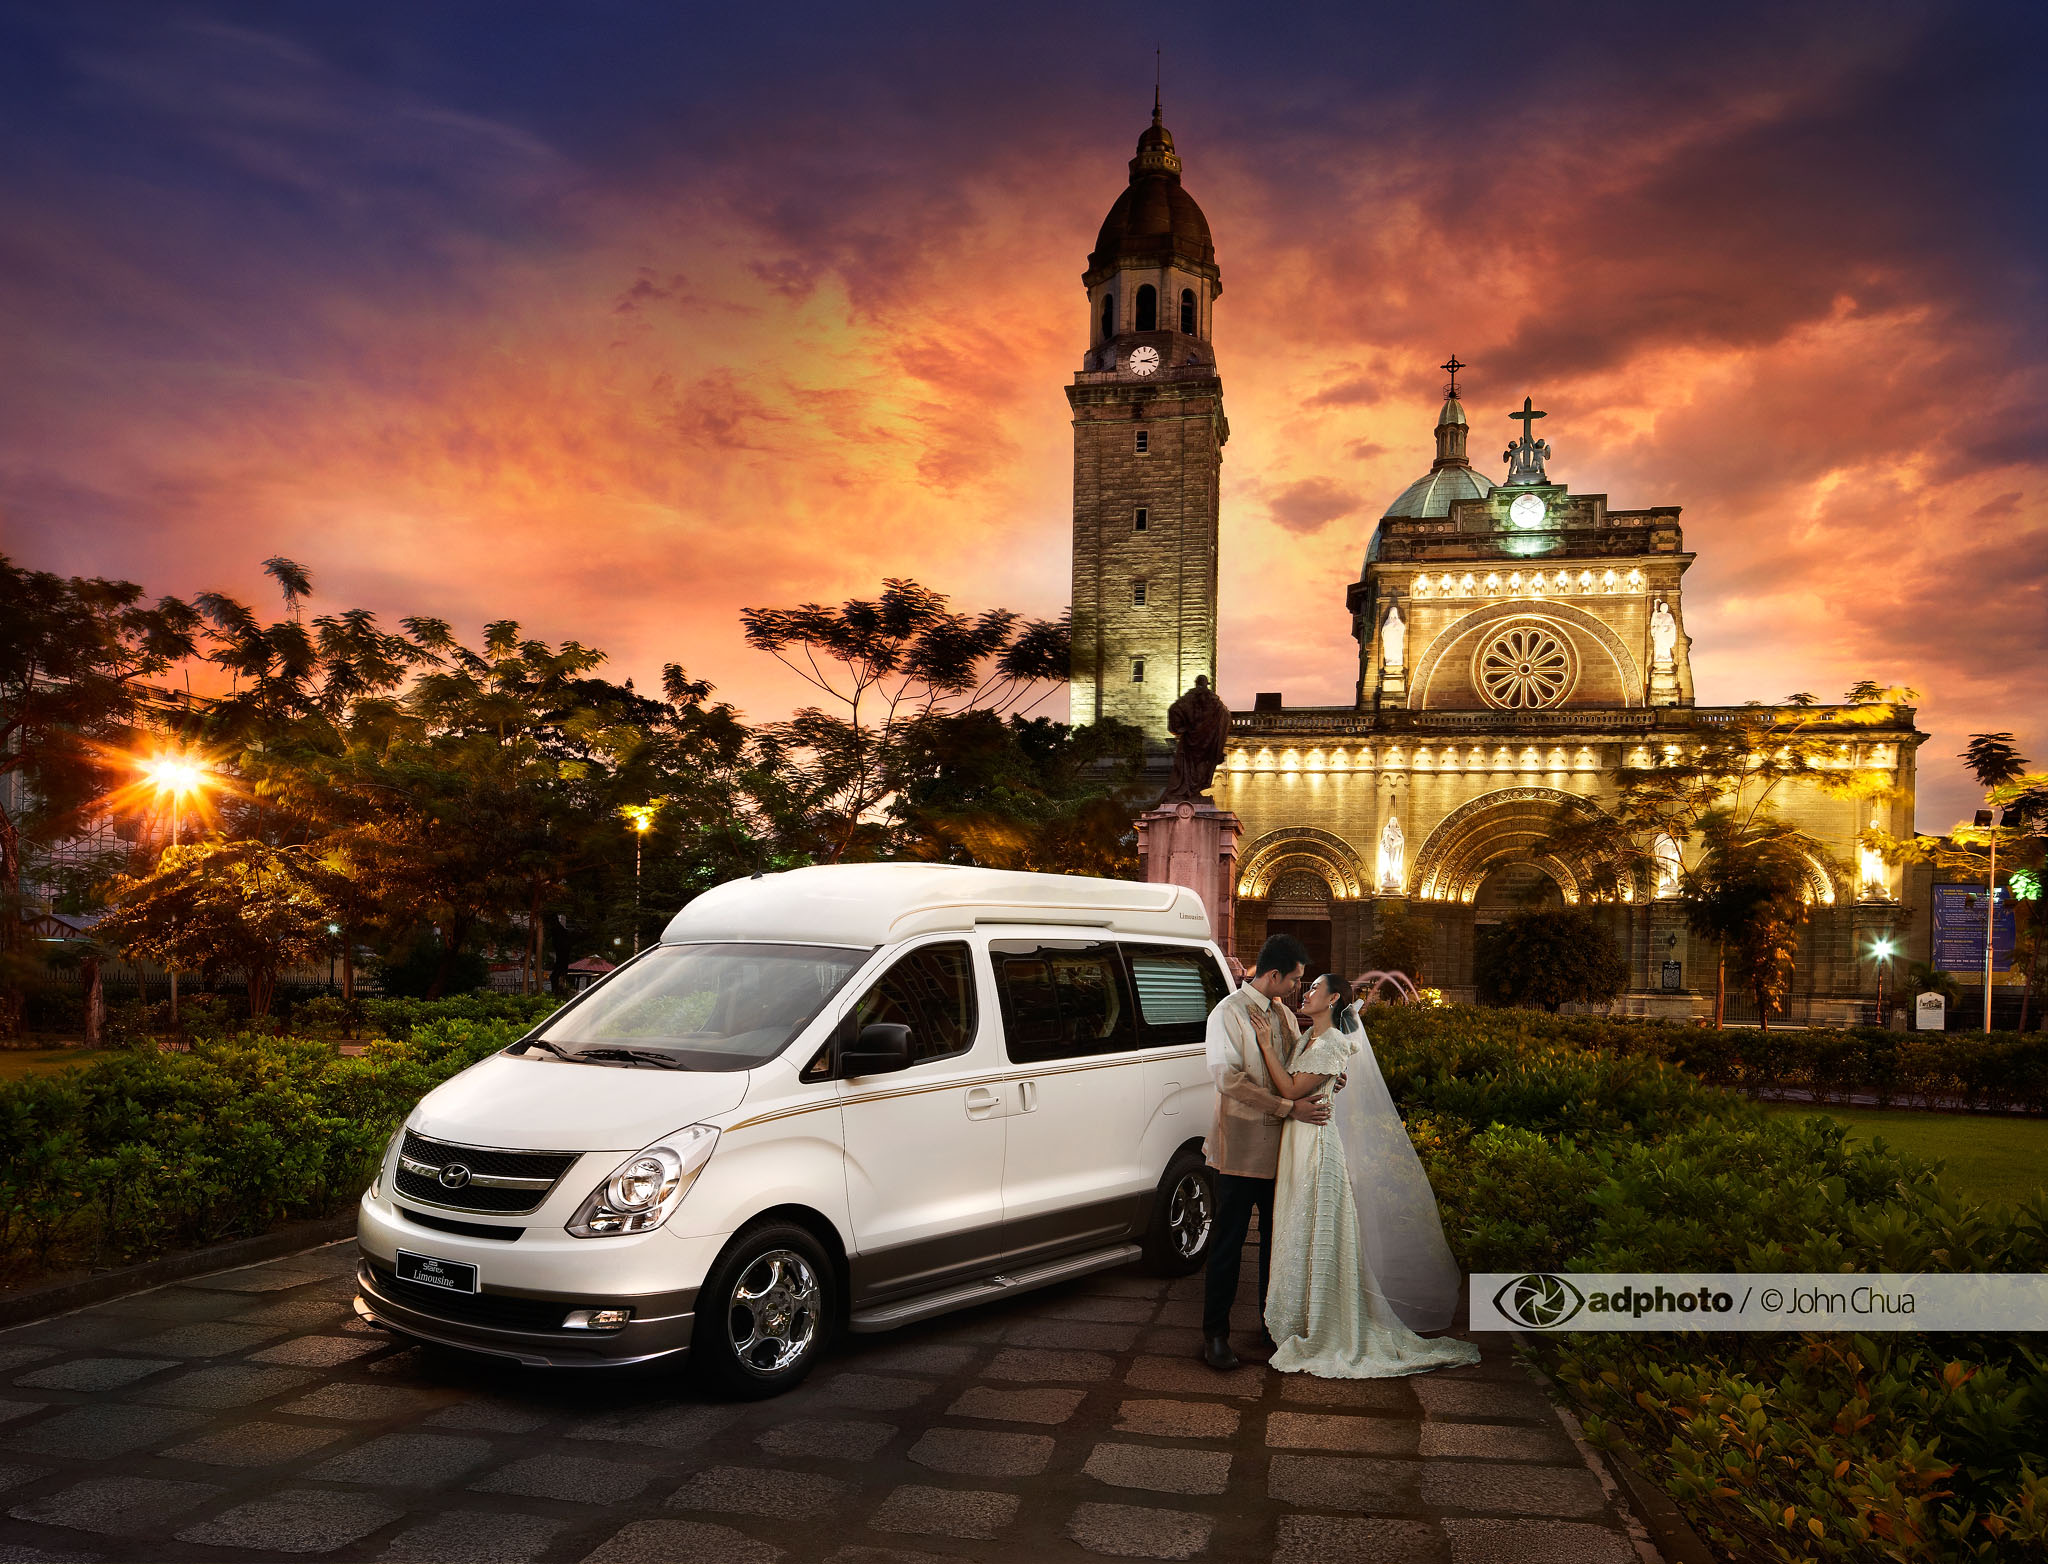 Automotive_John Chua_7.jpg